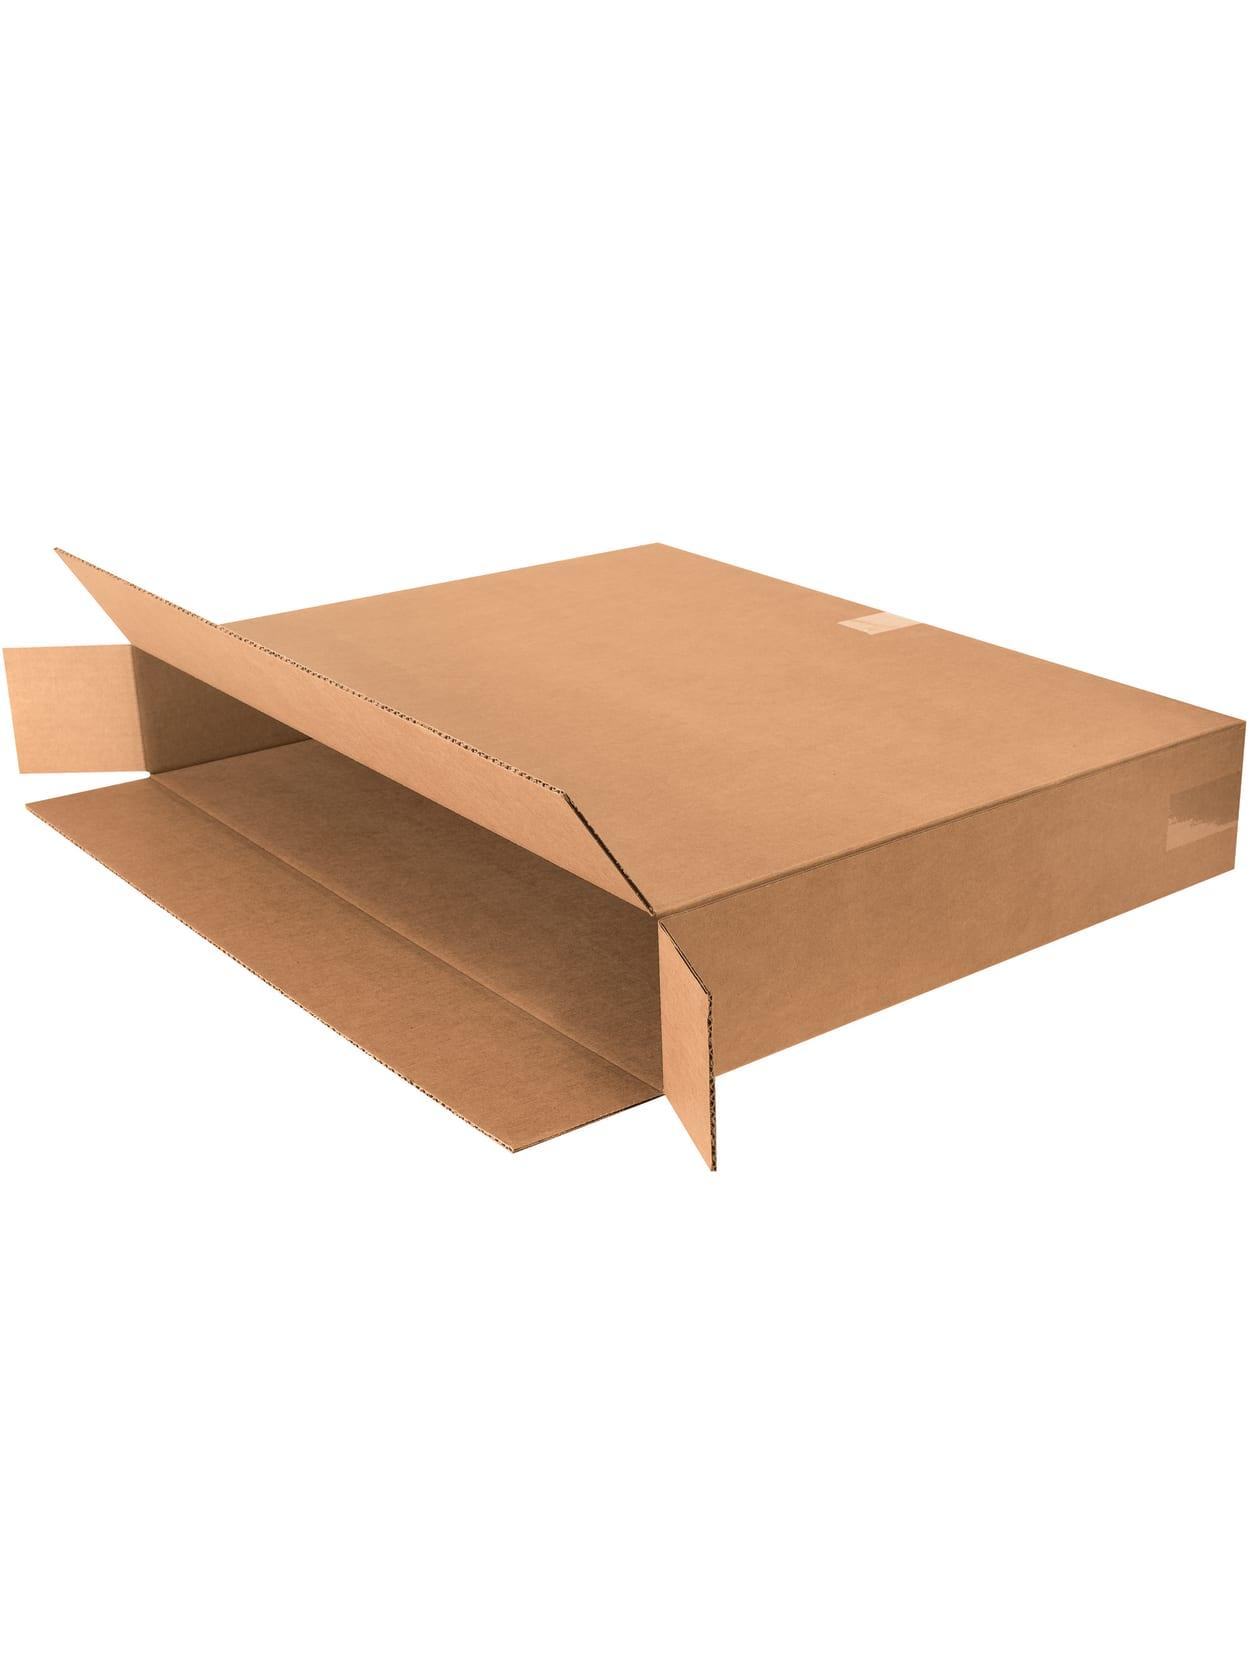 Office Depot Brand FOL Flat Panel TV Boxes 40 H x 40 W x 40 D Kraft